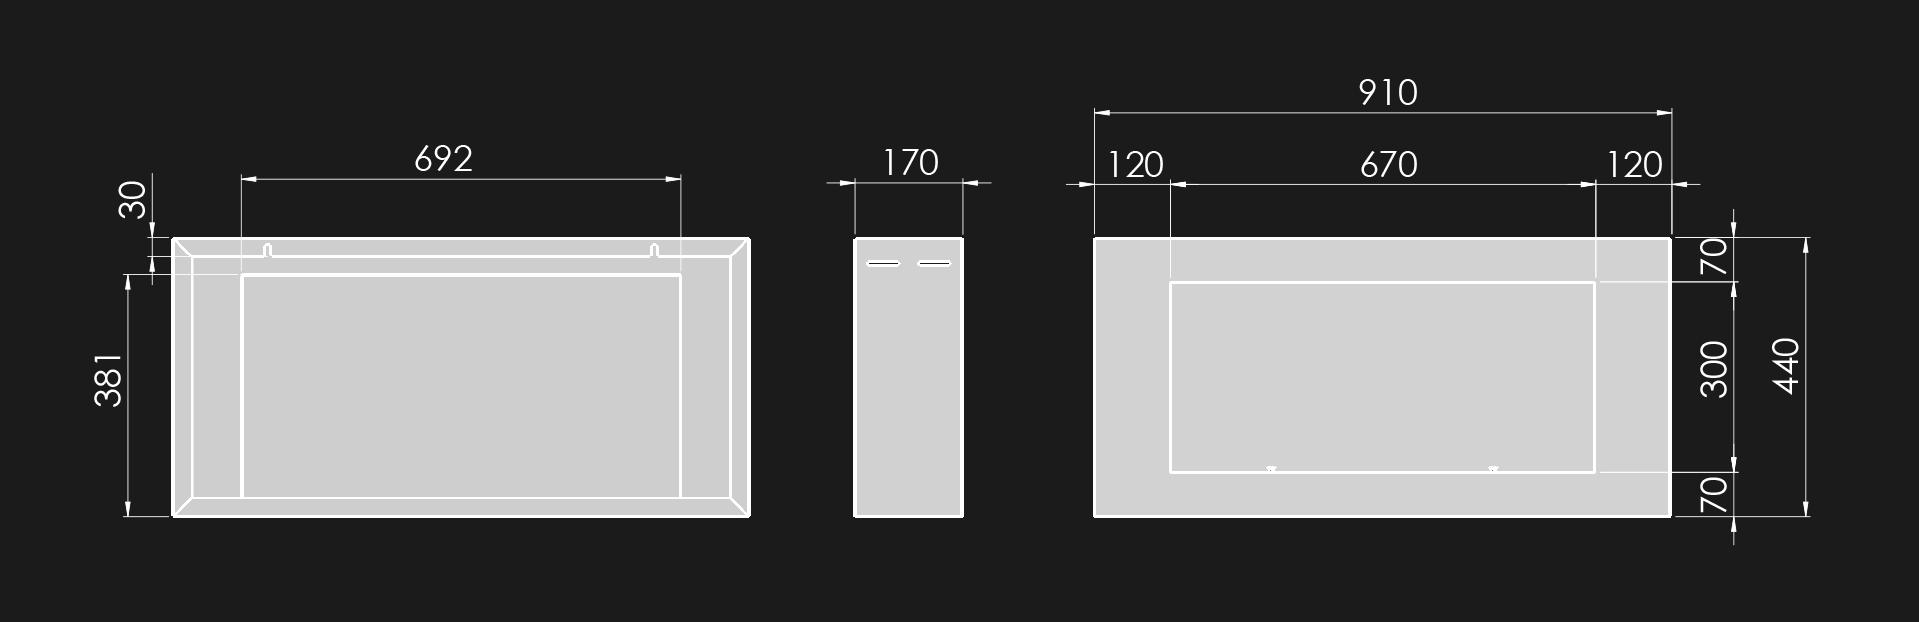 BLACKbox-910-esquemas